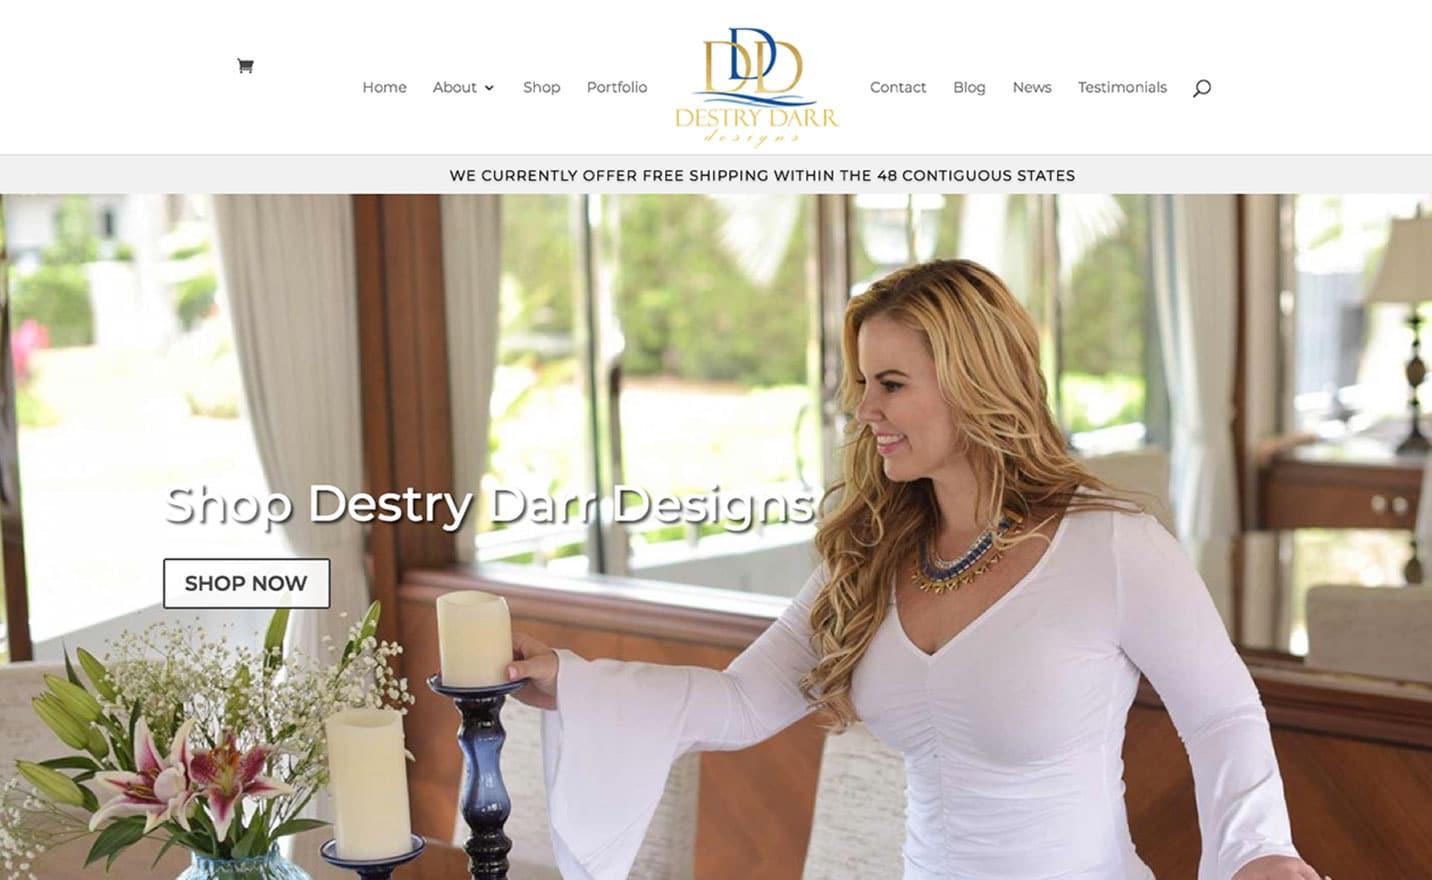 Shop Destry Darr Designs